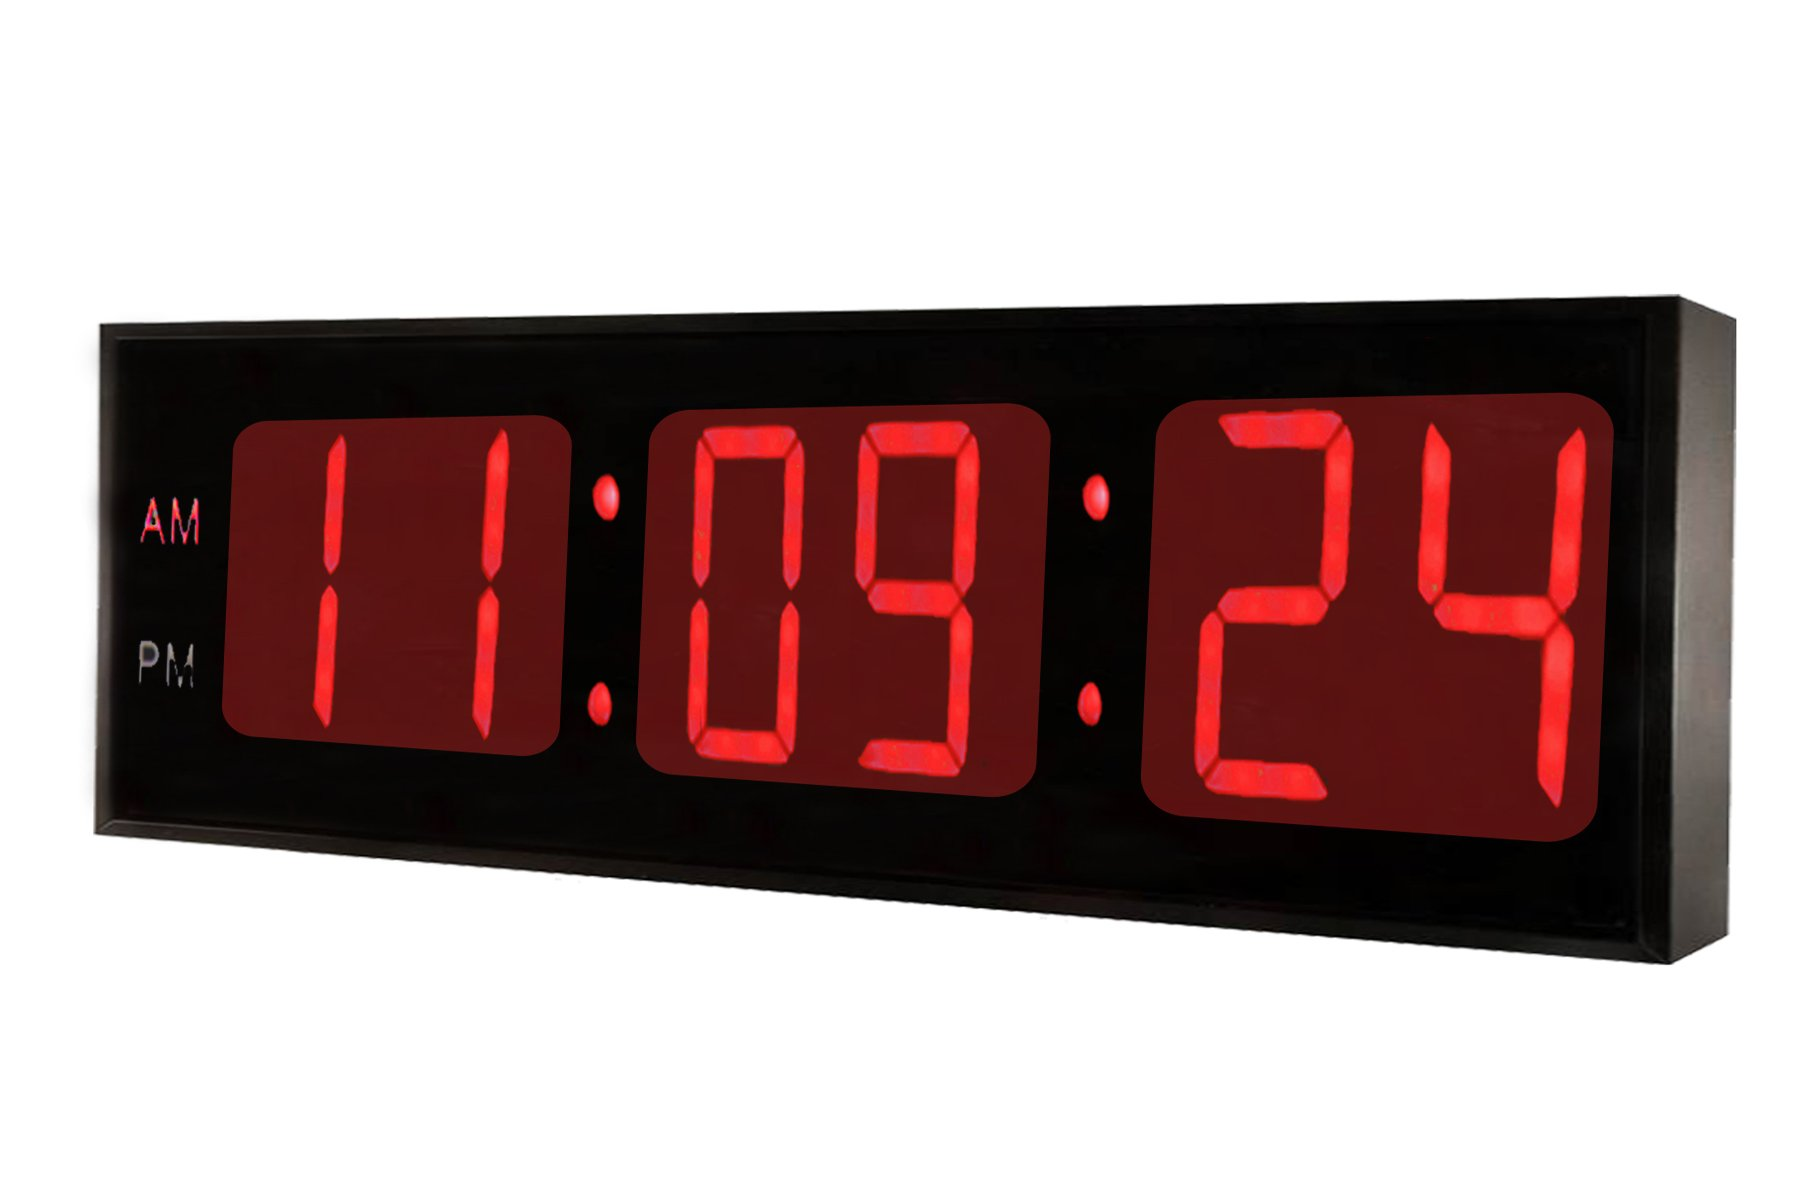 Ivation Huge Large Big Oversized Digital LED Clock - Shelf or Wall Mount (30 Inch - Red) by Ivation (Image #2)